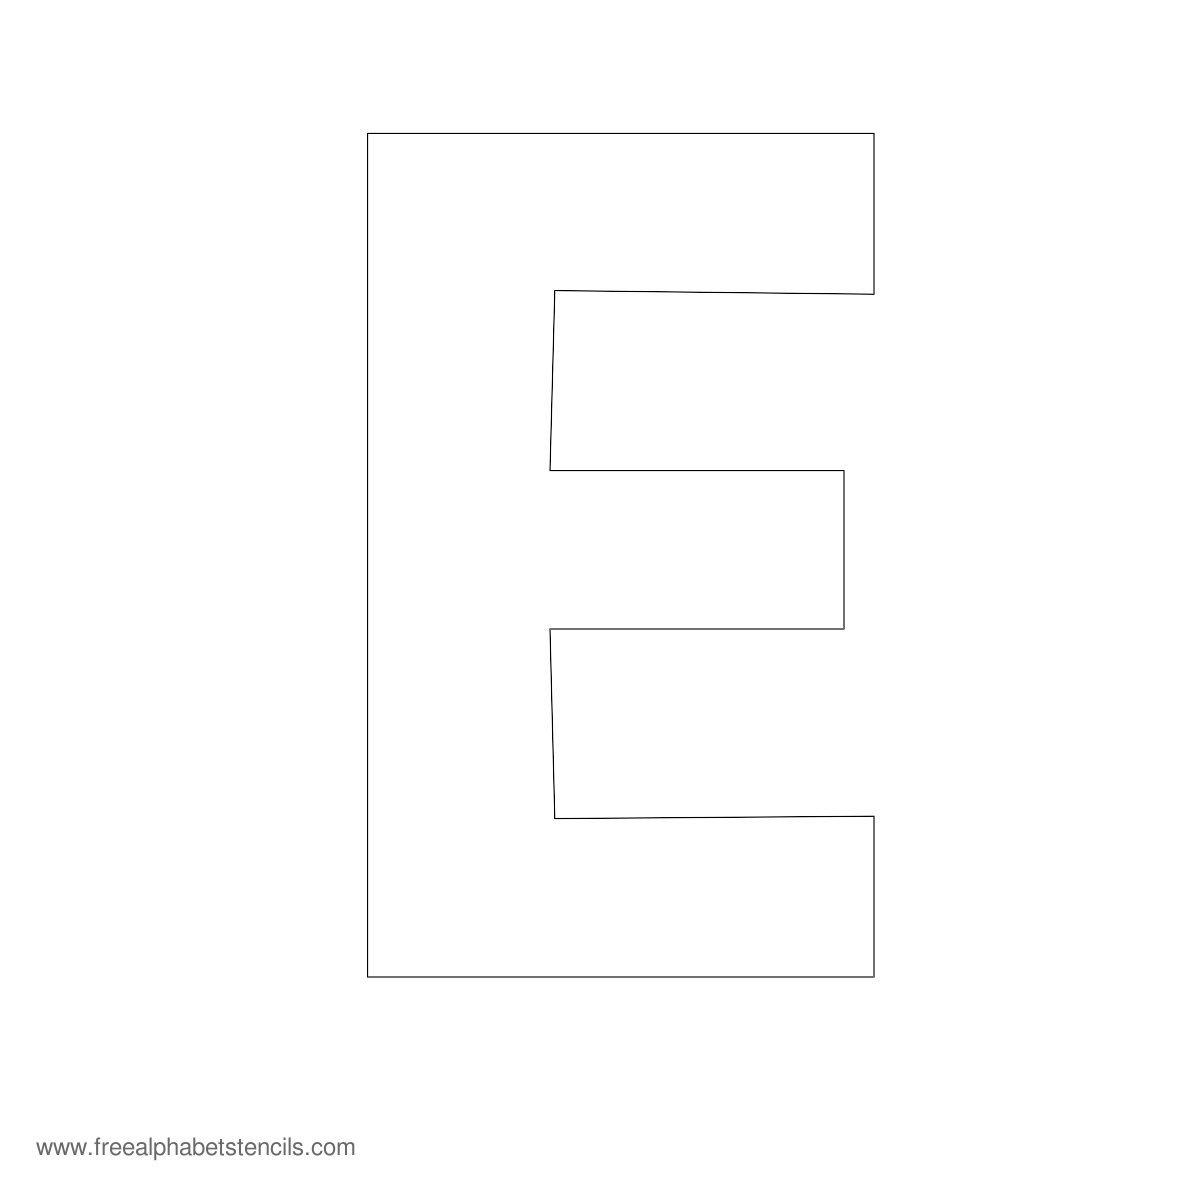 Large Alphabet Stencils | Freealphabetstencils - Free Printable Large Uppercase Alphabet Letters